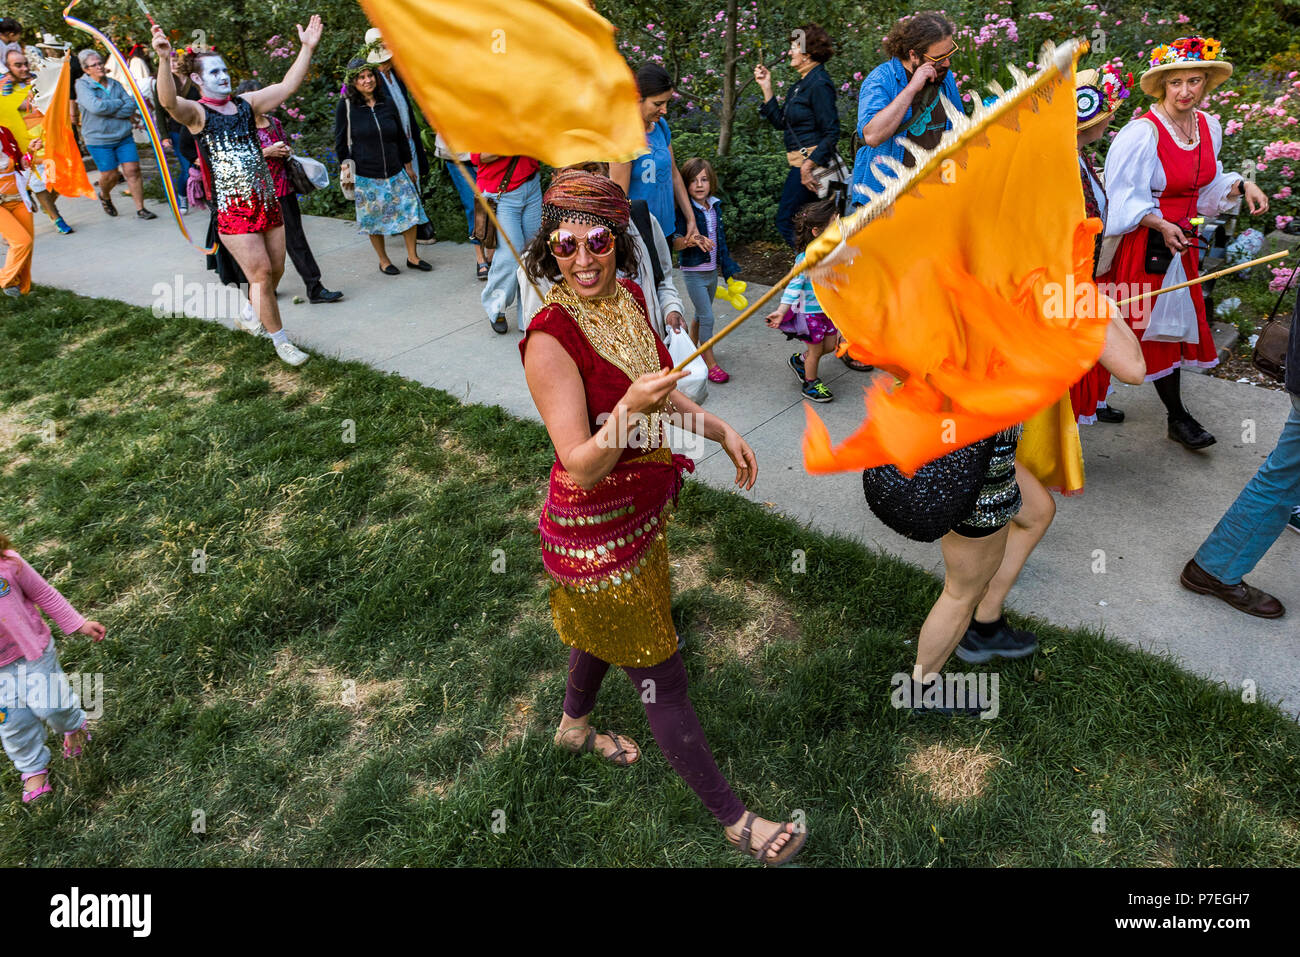 The Gathering Festival, Summer Solstice Celebration, Vancouver, Emery Barnes Park, British Columbia, Canada. - Stock Image